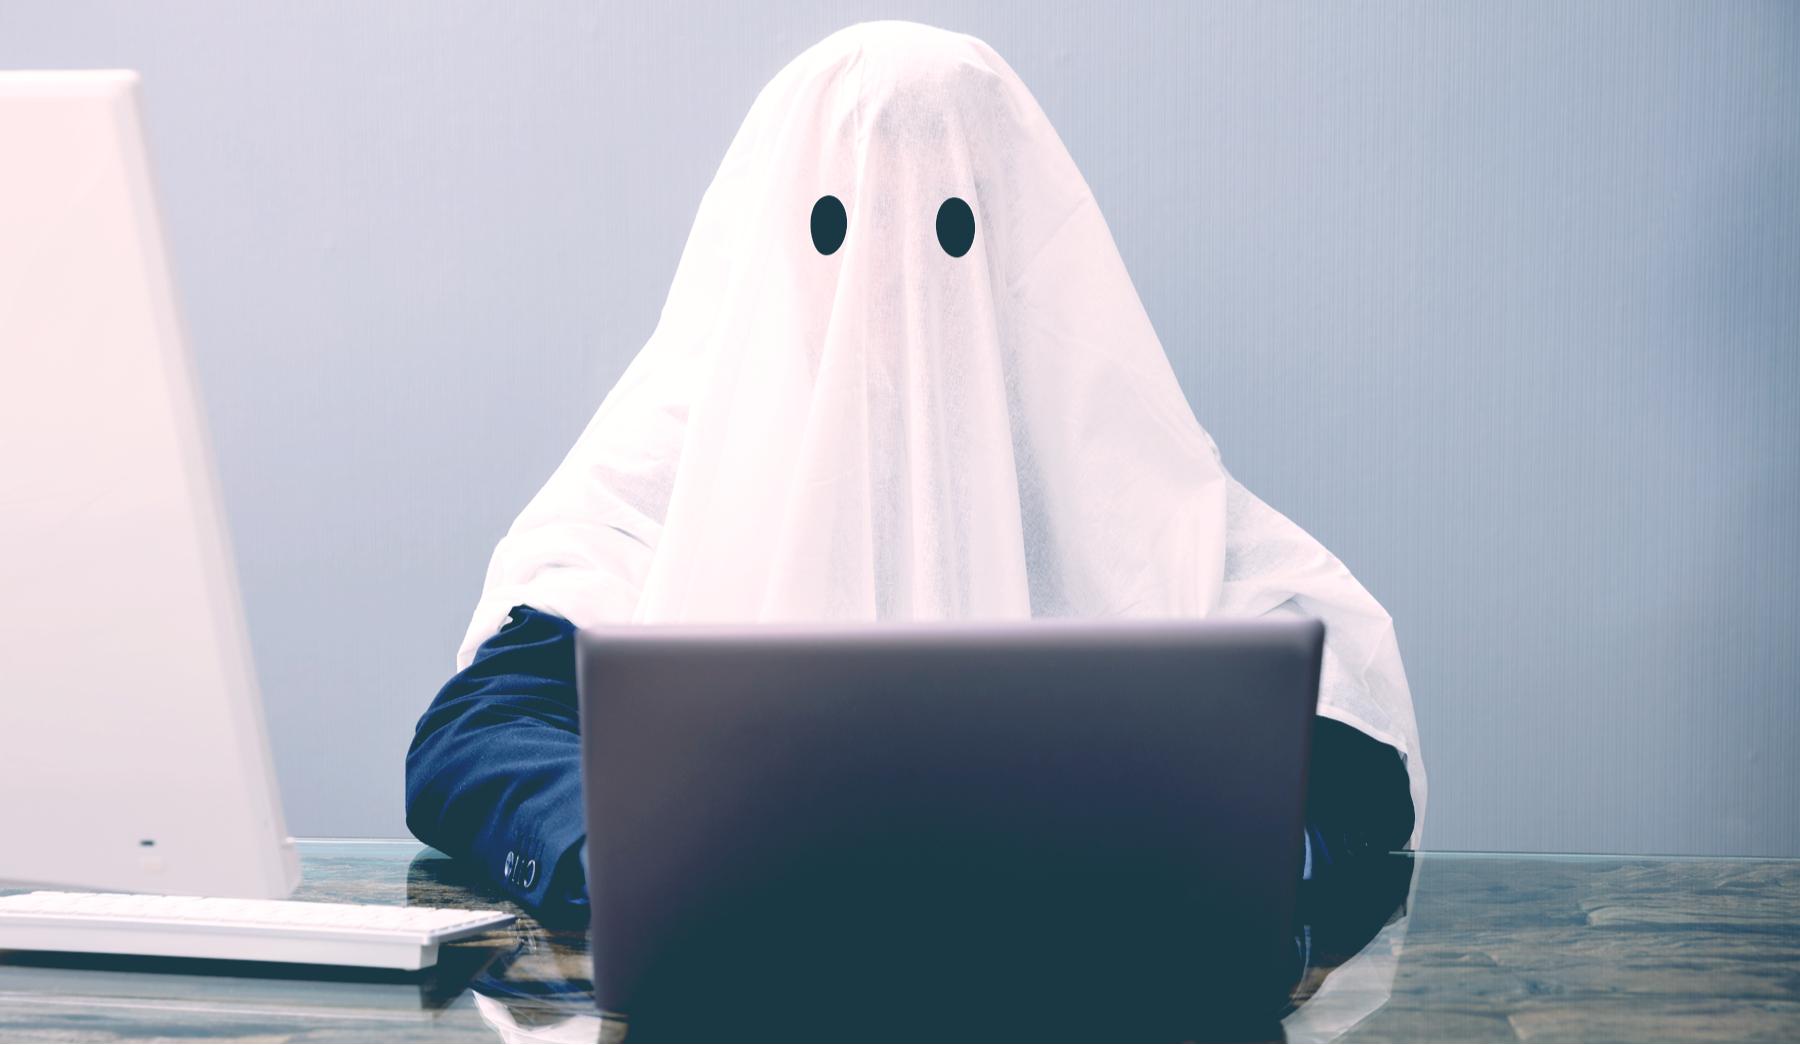 Die Perfekte Bewerbung Ein Ghostwriter Fur